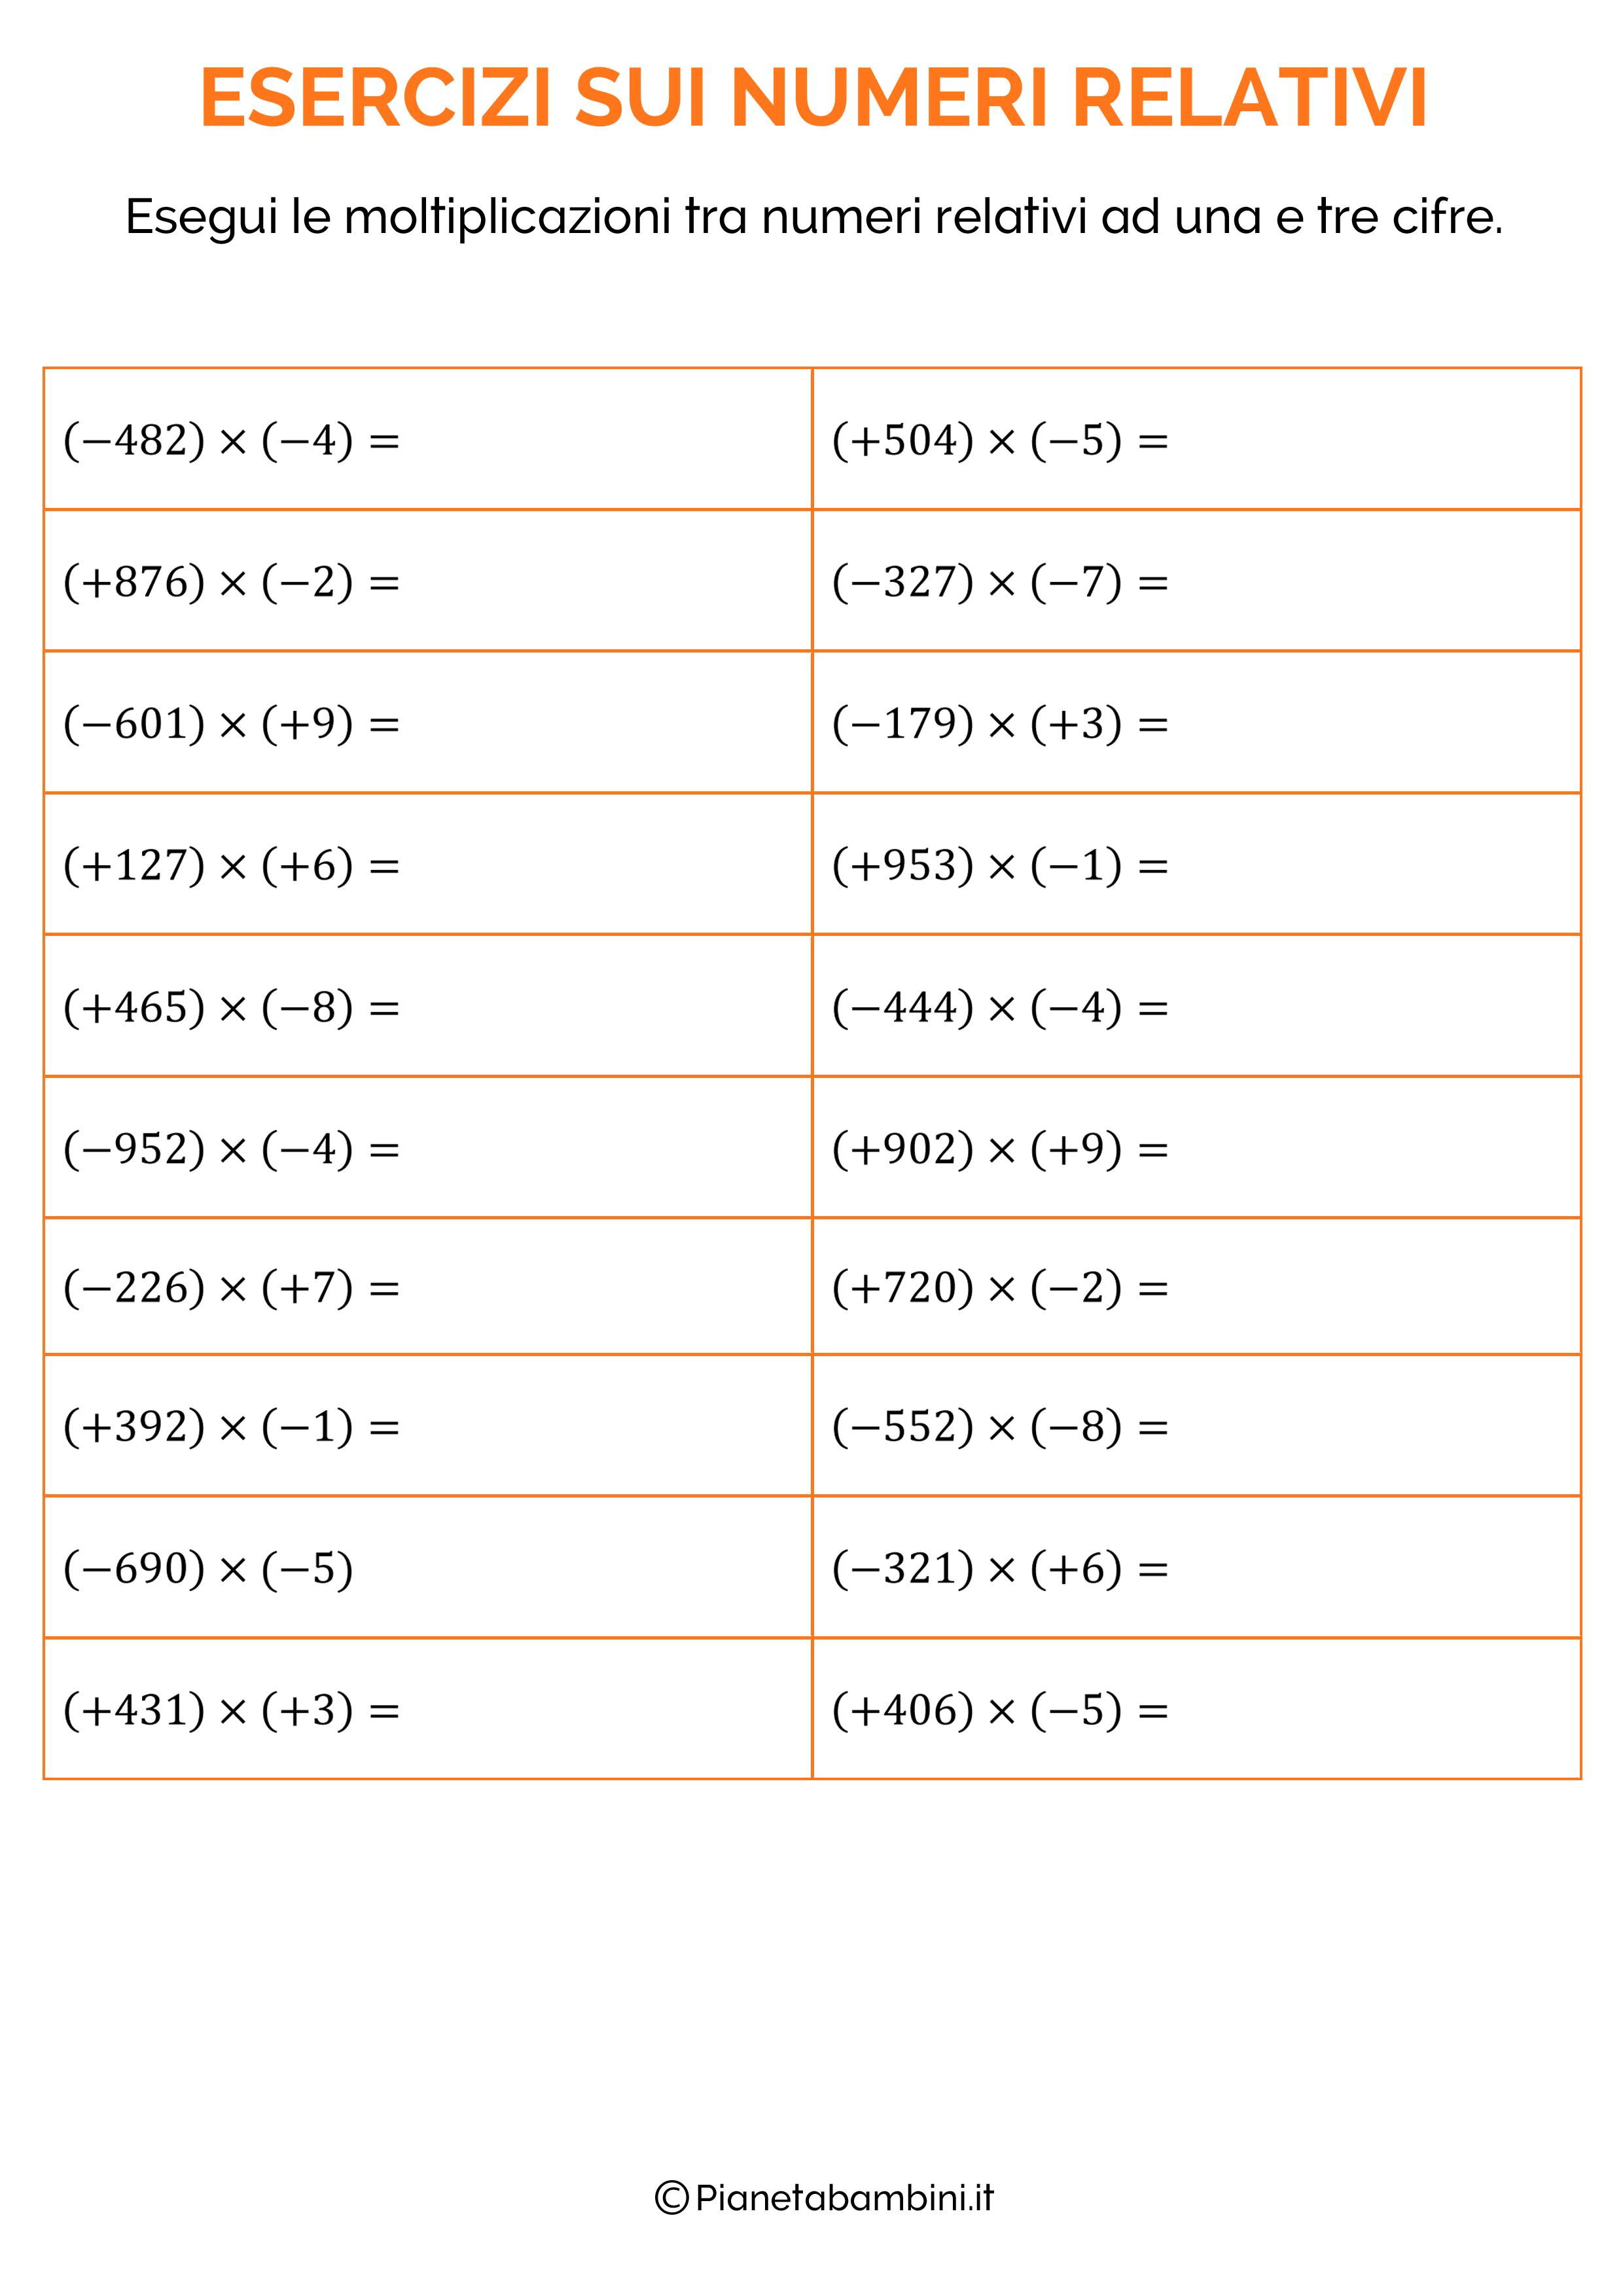 Moltiplicazioni tra numeri relativi